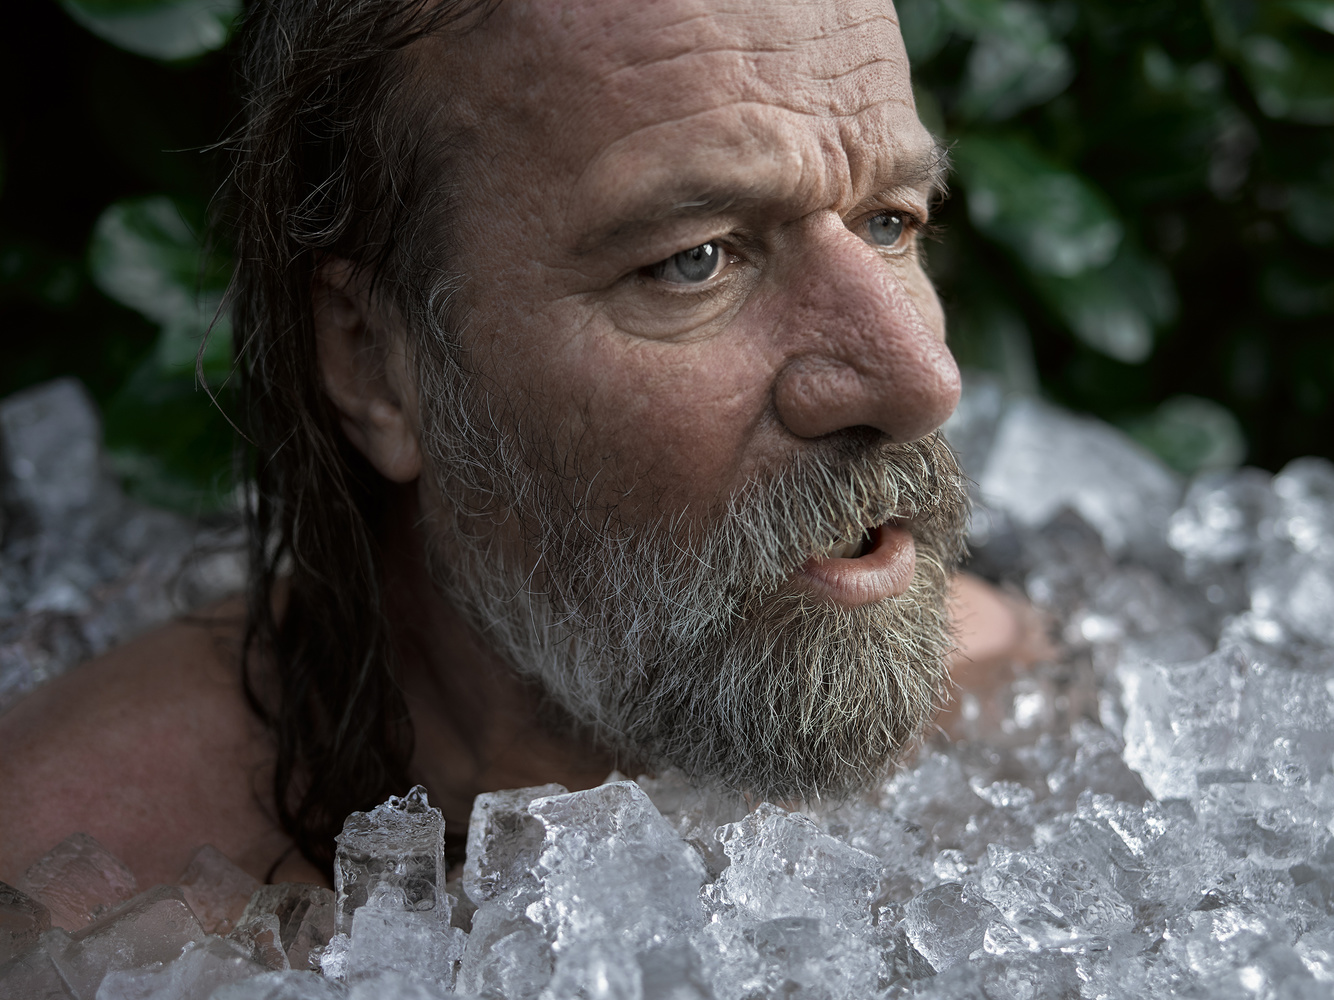 Wim Hof a.k.a. The Iceman by Jeroen Nieuwhuis